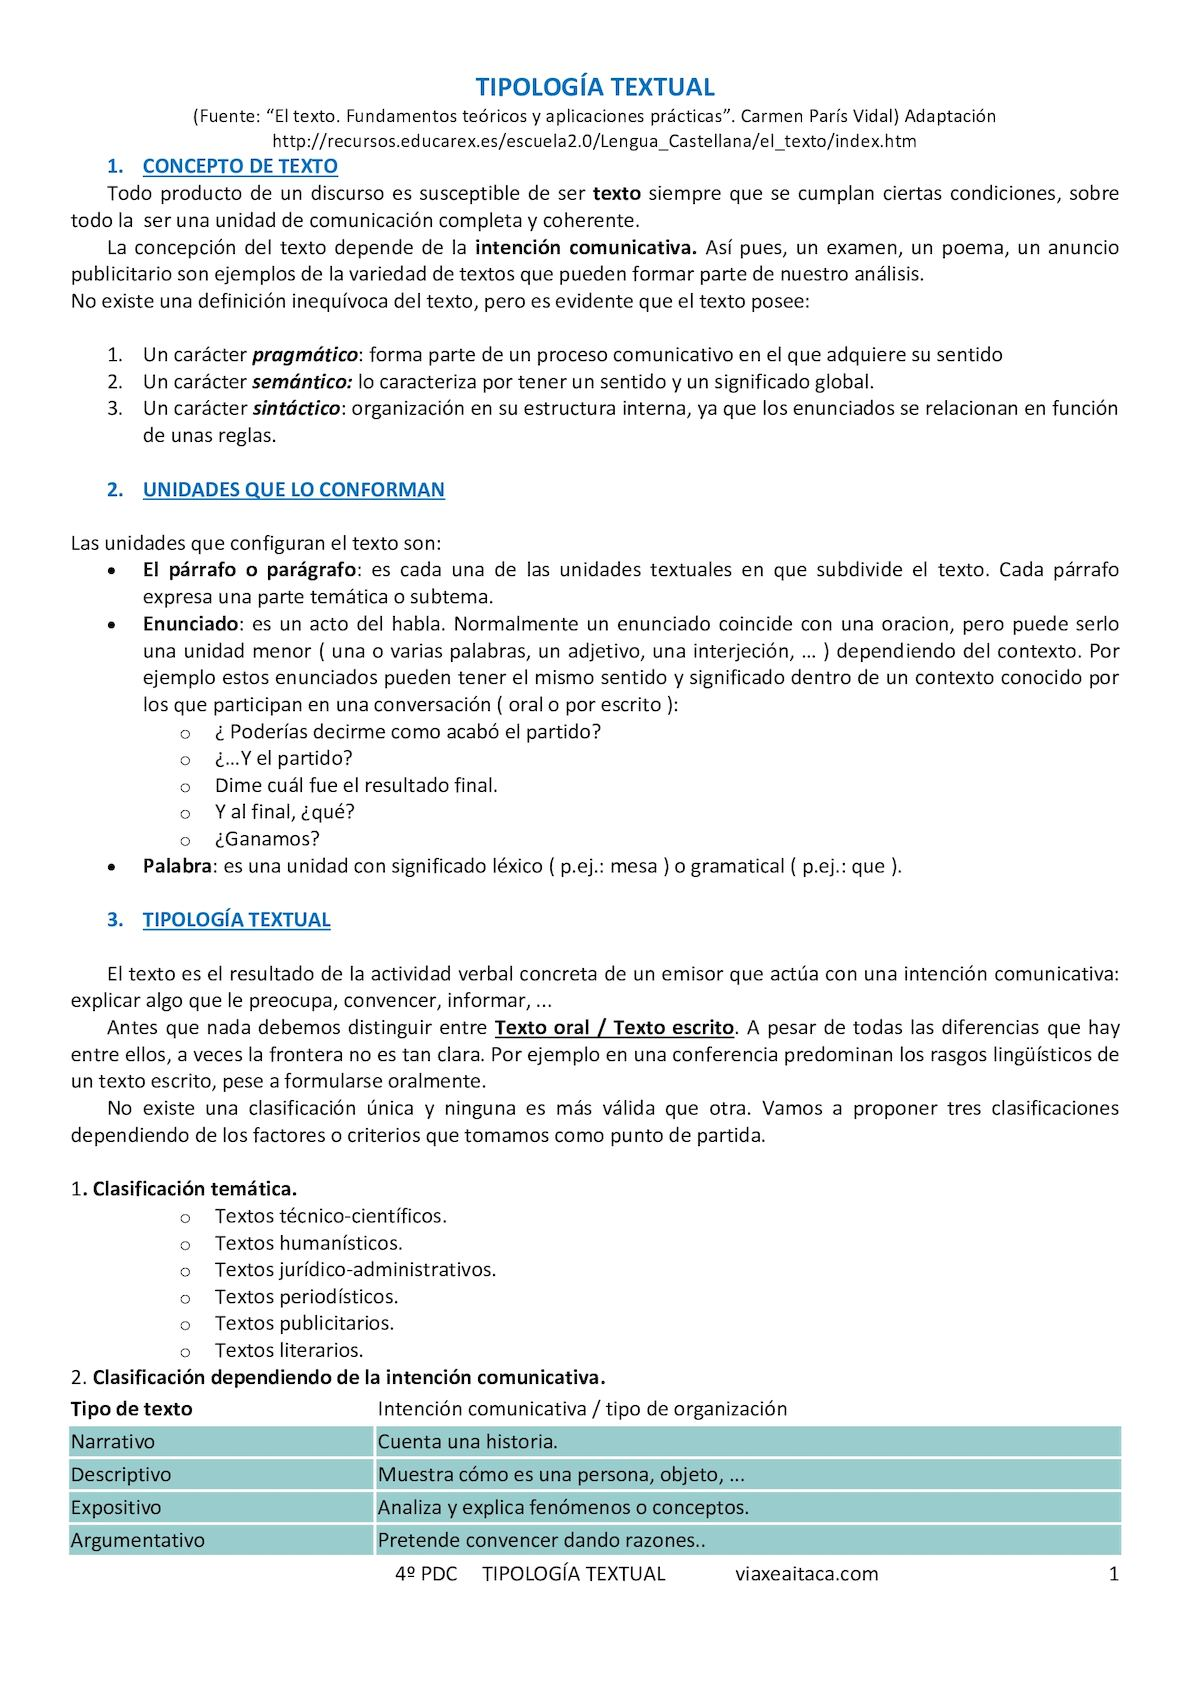 Tipologia Textual Sena Calameo Downloader